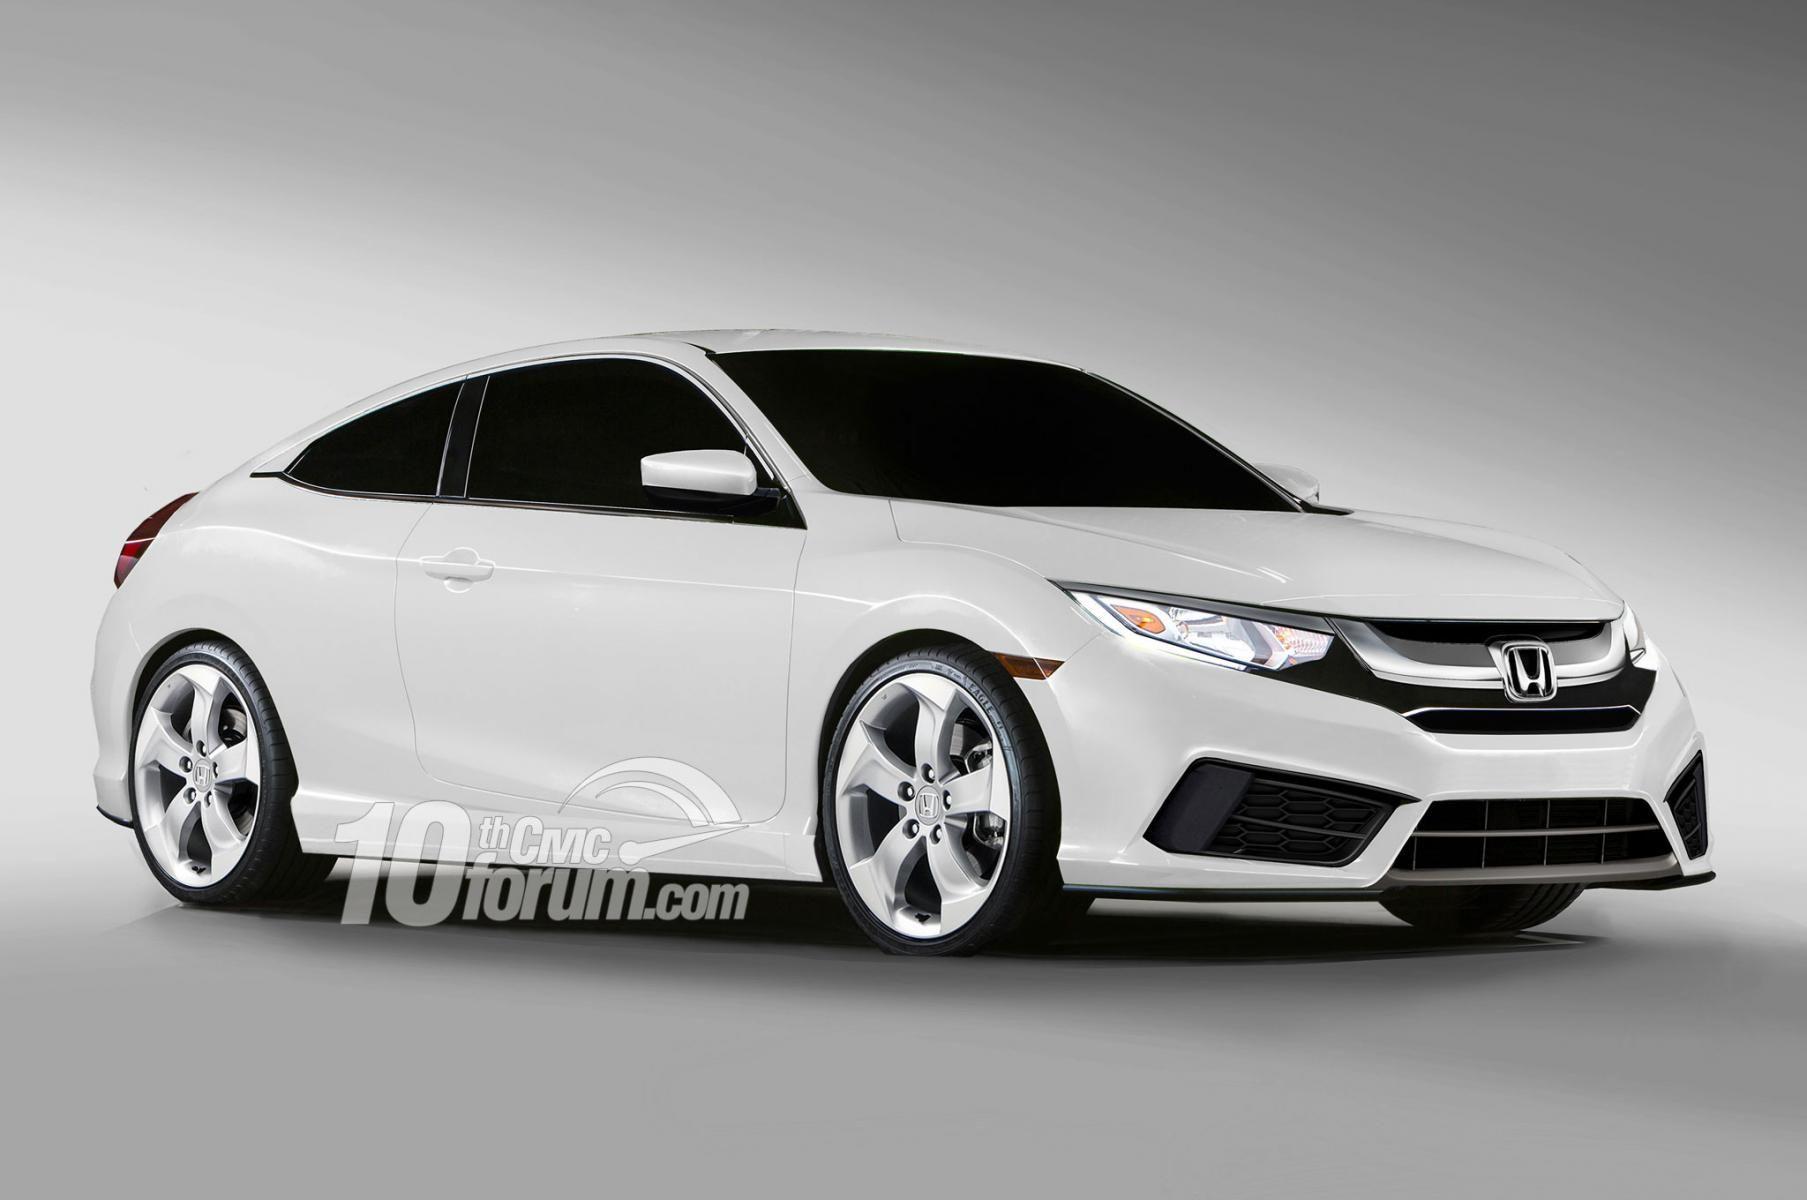 2016 honda civic sedan coupe hatchback renders leaked 10th gen civic forum